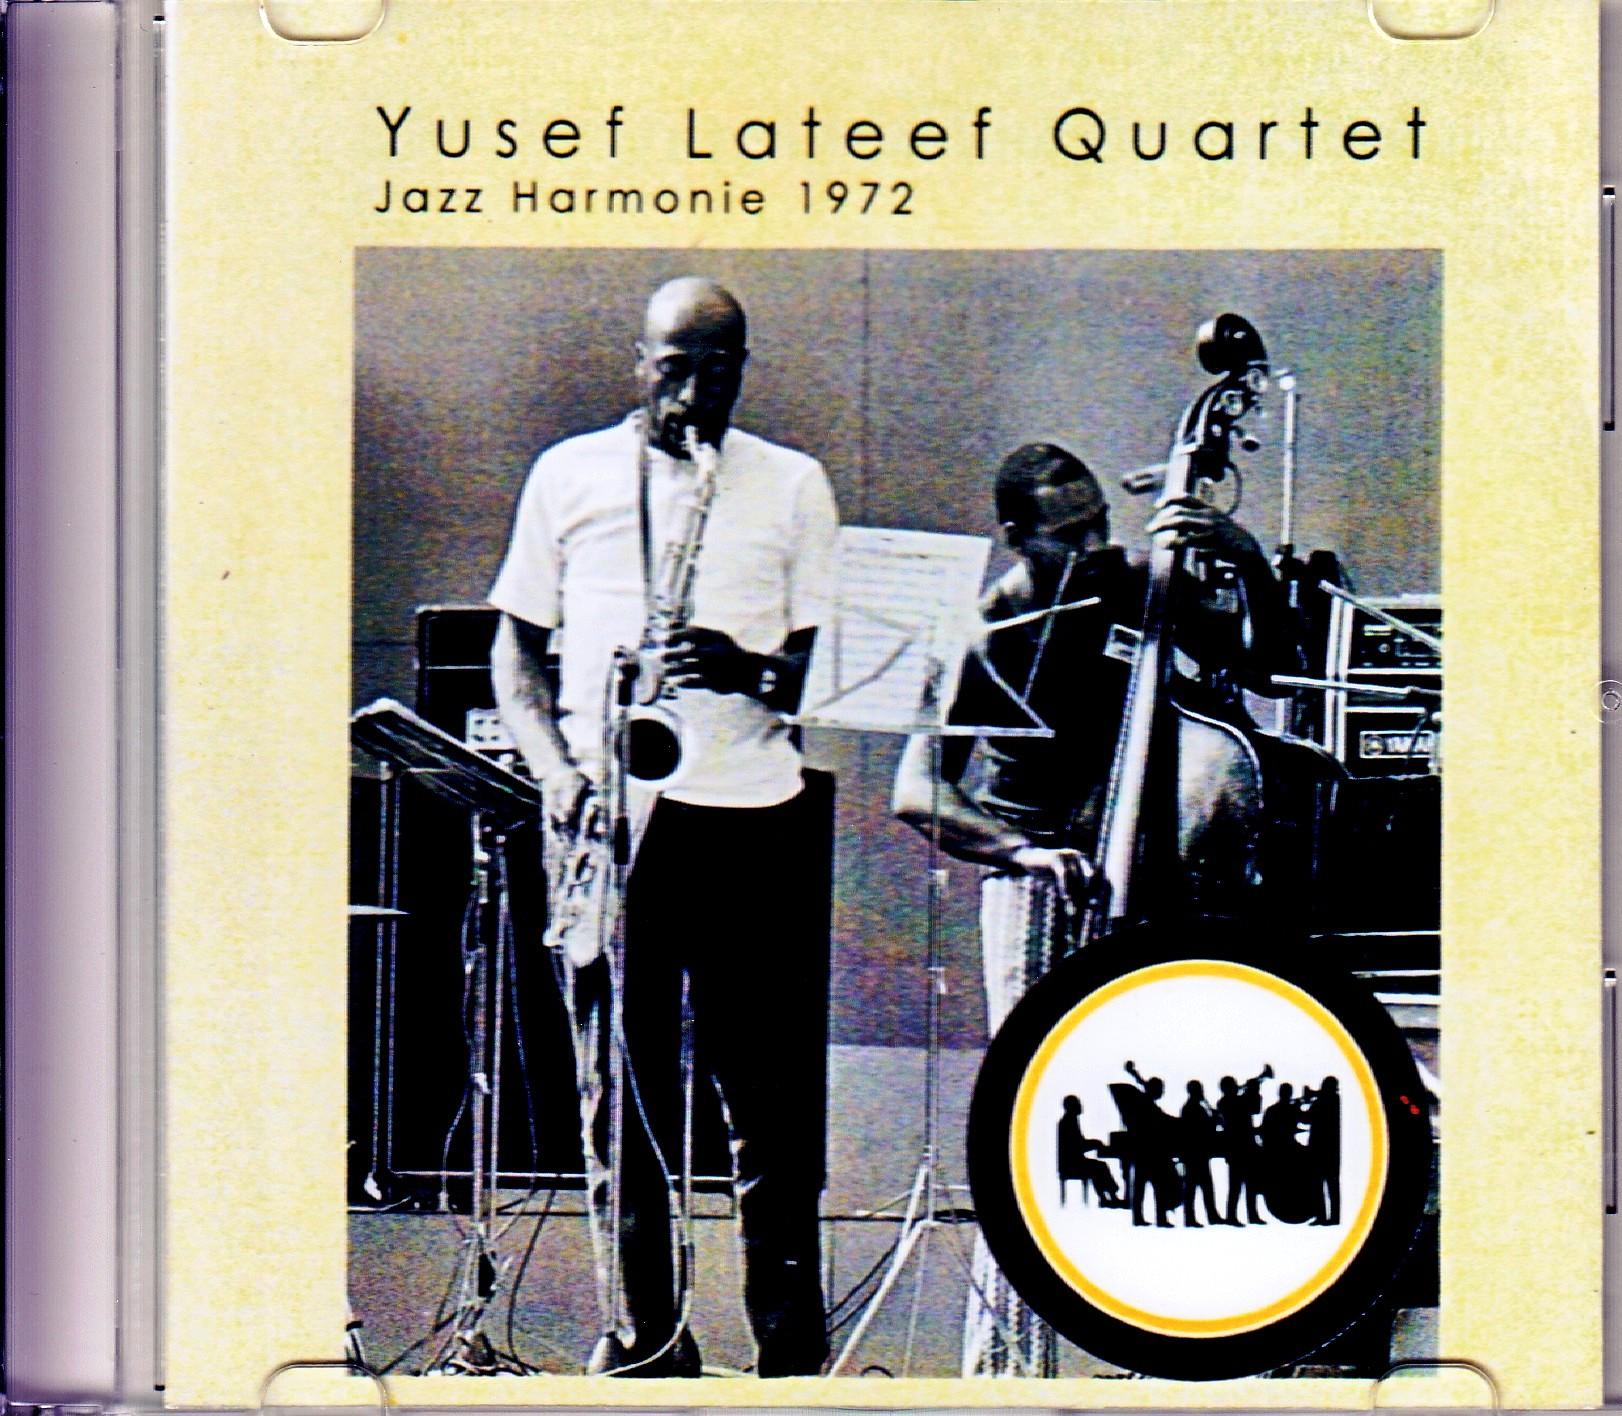 Yusef Lateef Quartet,Kenny Barron ユセフ・ラティーフ ケニー・バロン/France 1972